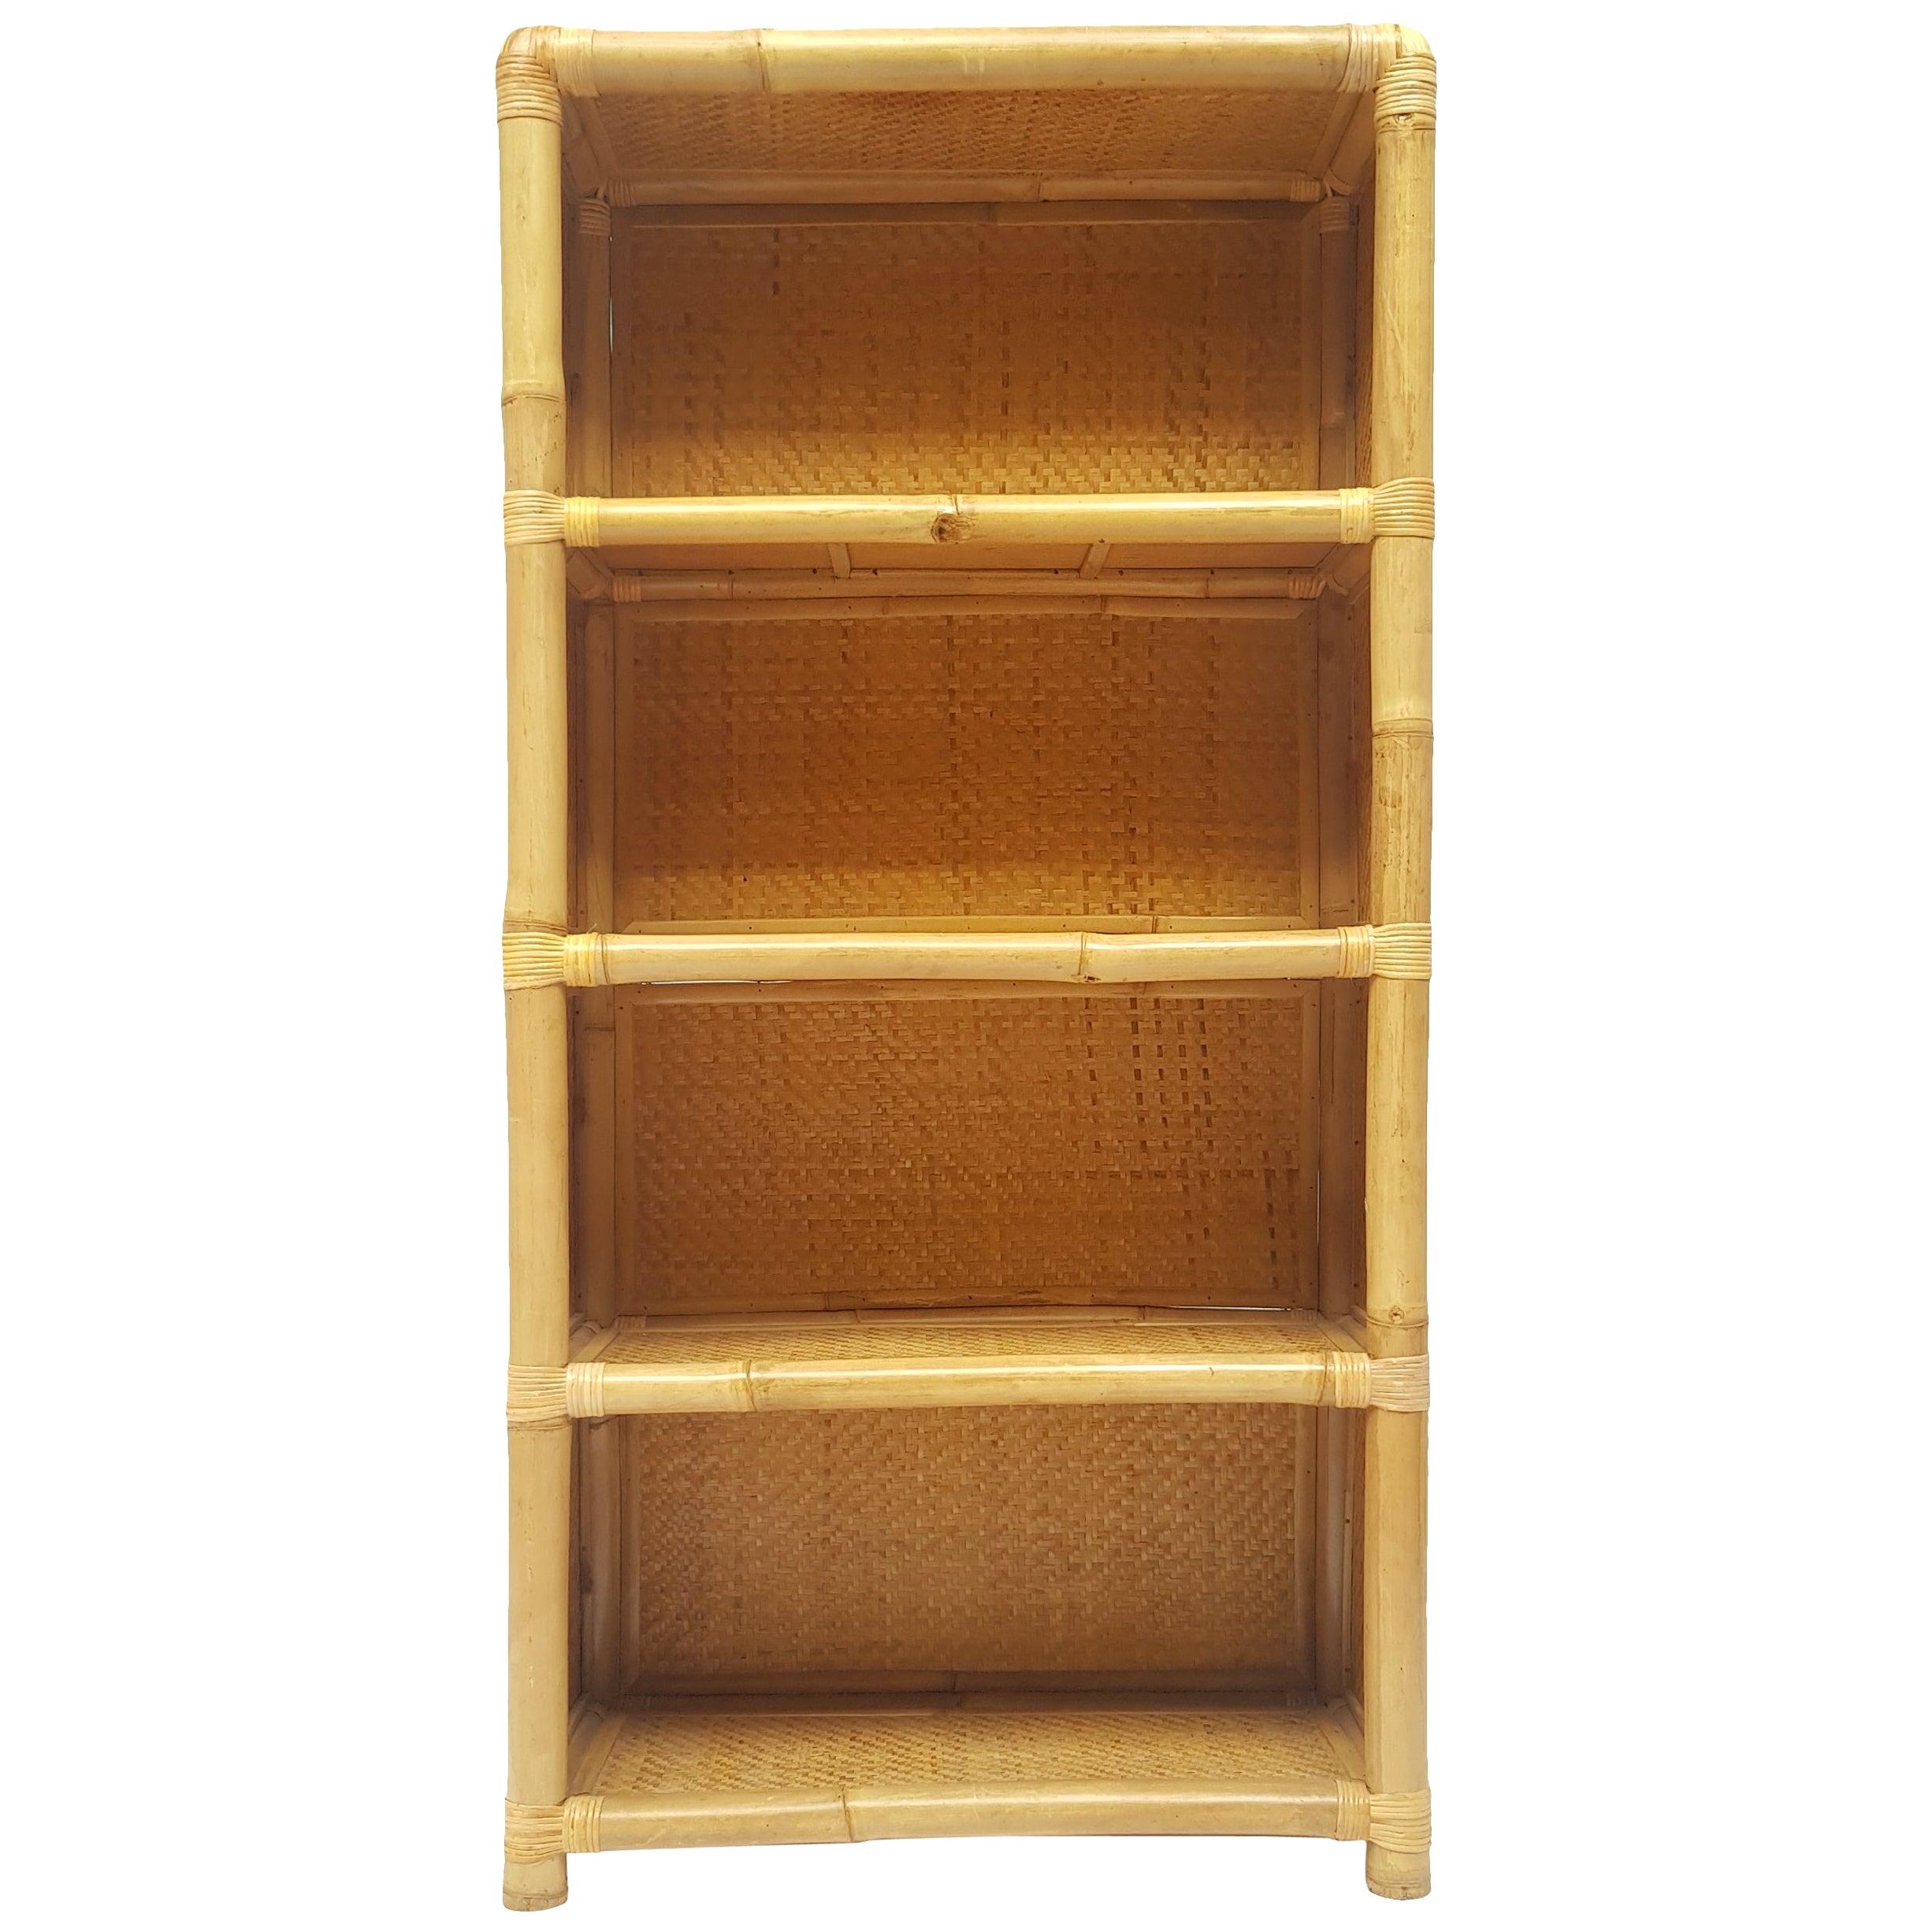 Late 20th Century Spanish Bamboo Bookcase, 1970s